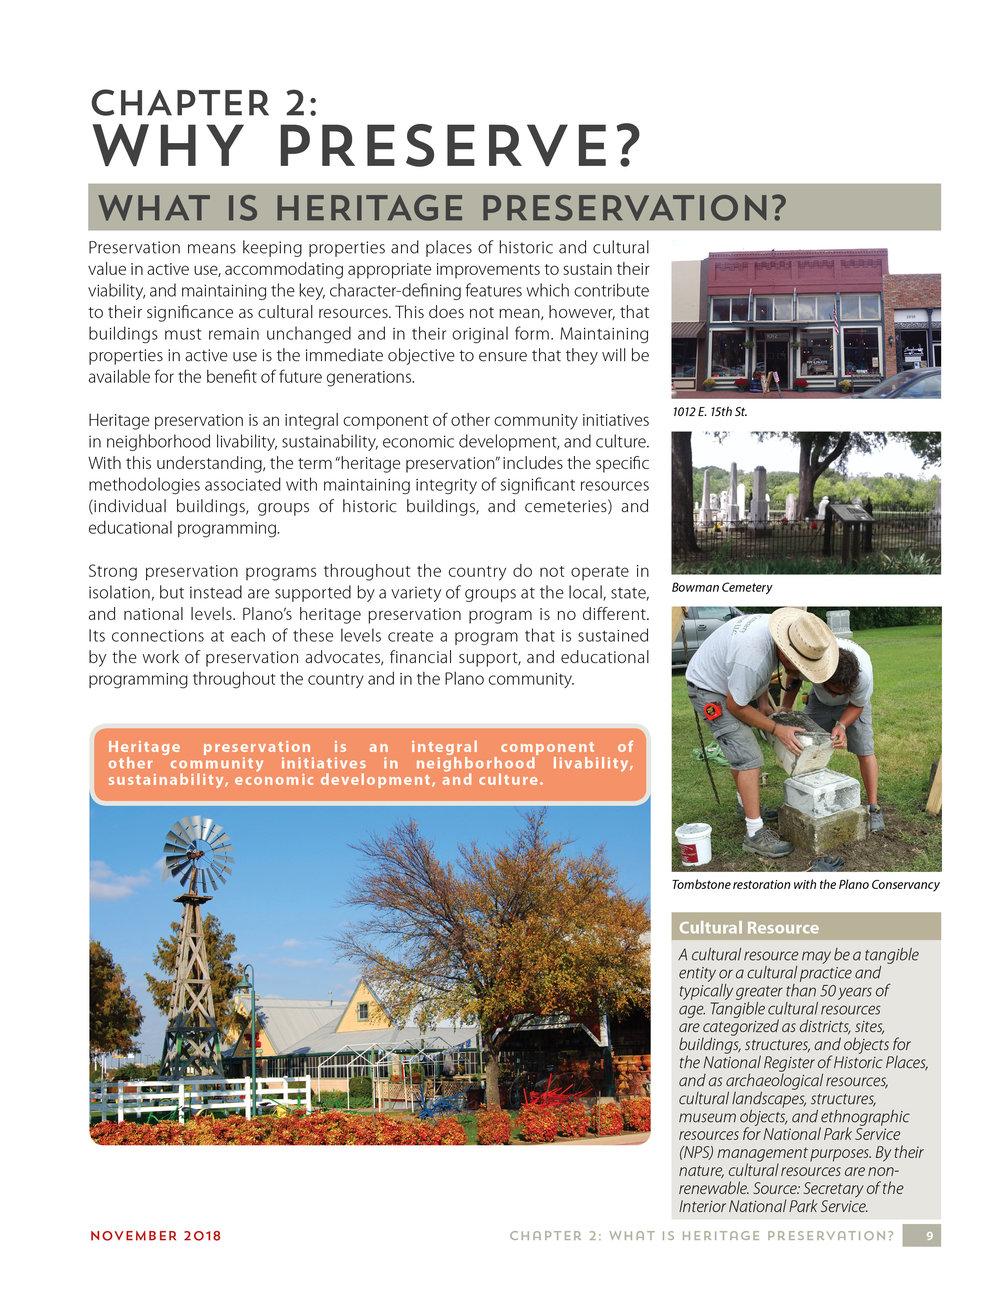 02 - Why Preserve?